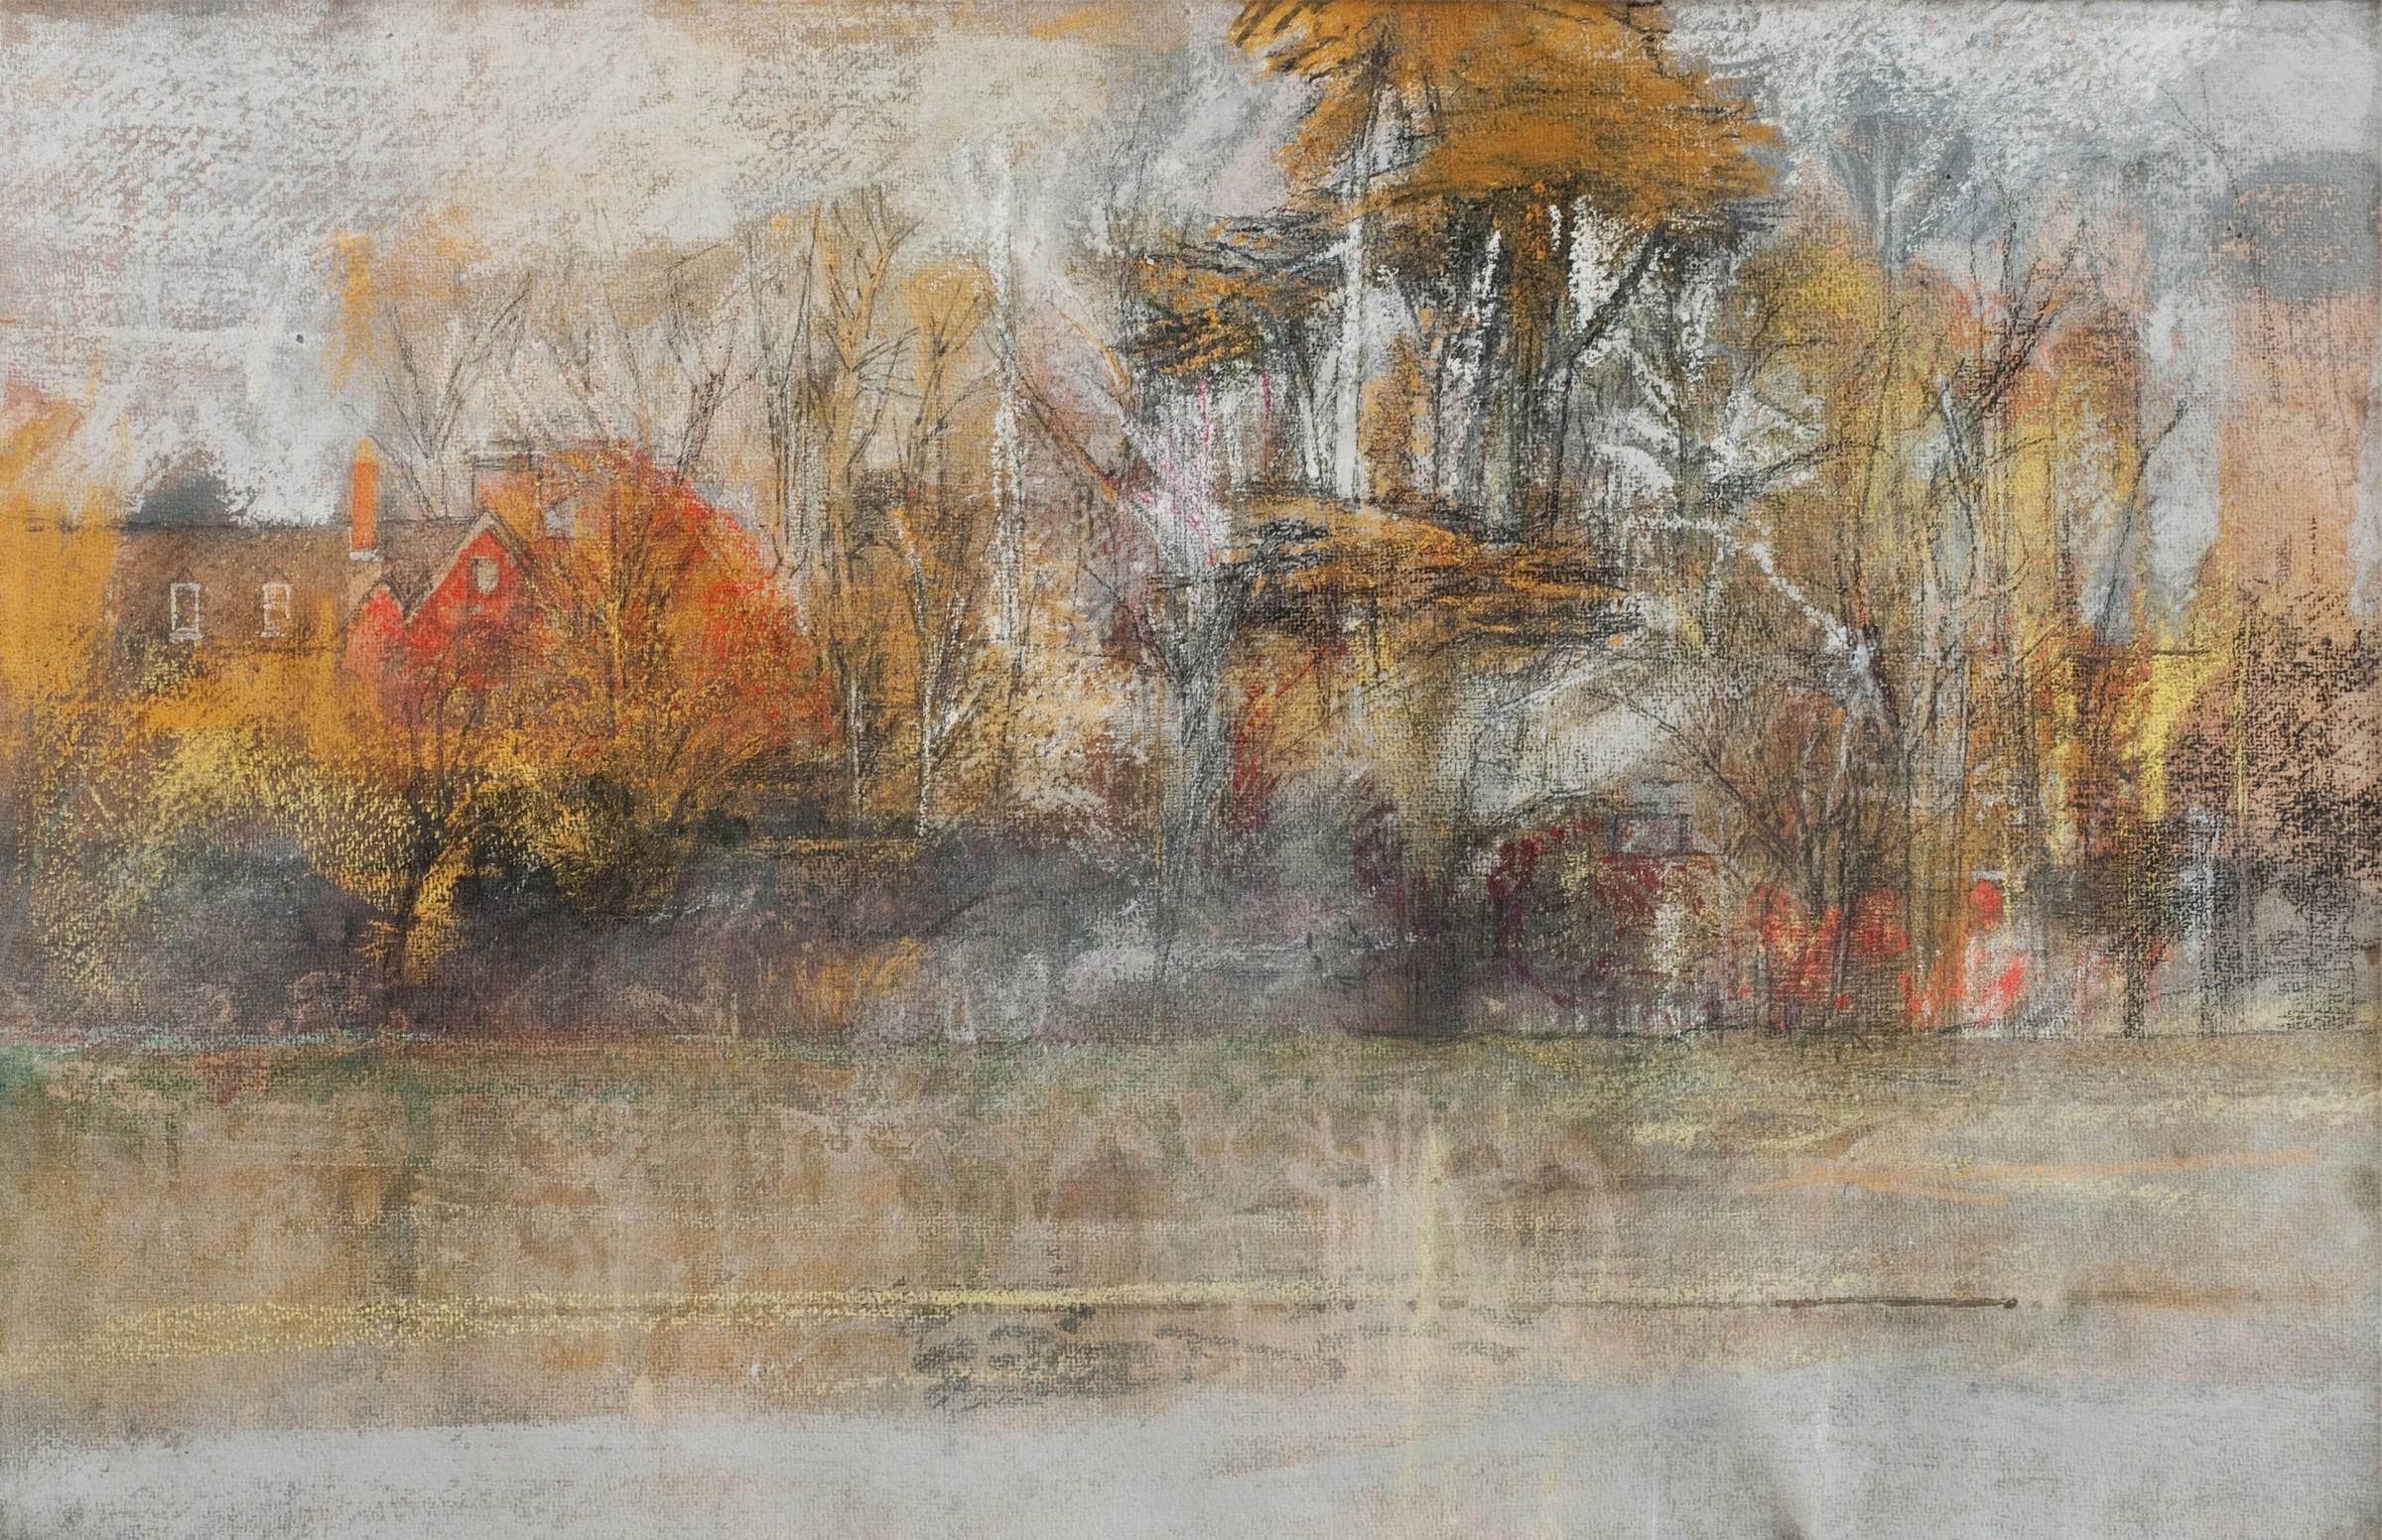 <span class=&#34;link fancybox-details-link&#34;><a href=&#34;/artists/87-paul-newland/works/9570-paul-newland-trees-and-farmhouse/&#34;>View Detail Page</a></span><div class=&#34;artist&#34;><span class=&#34;artist&#34;><strong>Paul Newland</strong></span></div><div class=&#34;title&#34;><em>Trees and Farmhouse</em></div><div class=&#34;medium&#34;>watercolour, pencil & chalk</div>